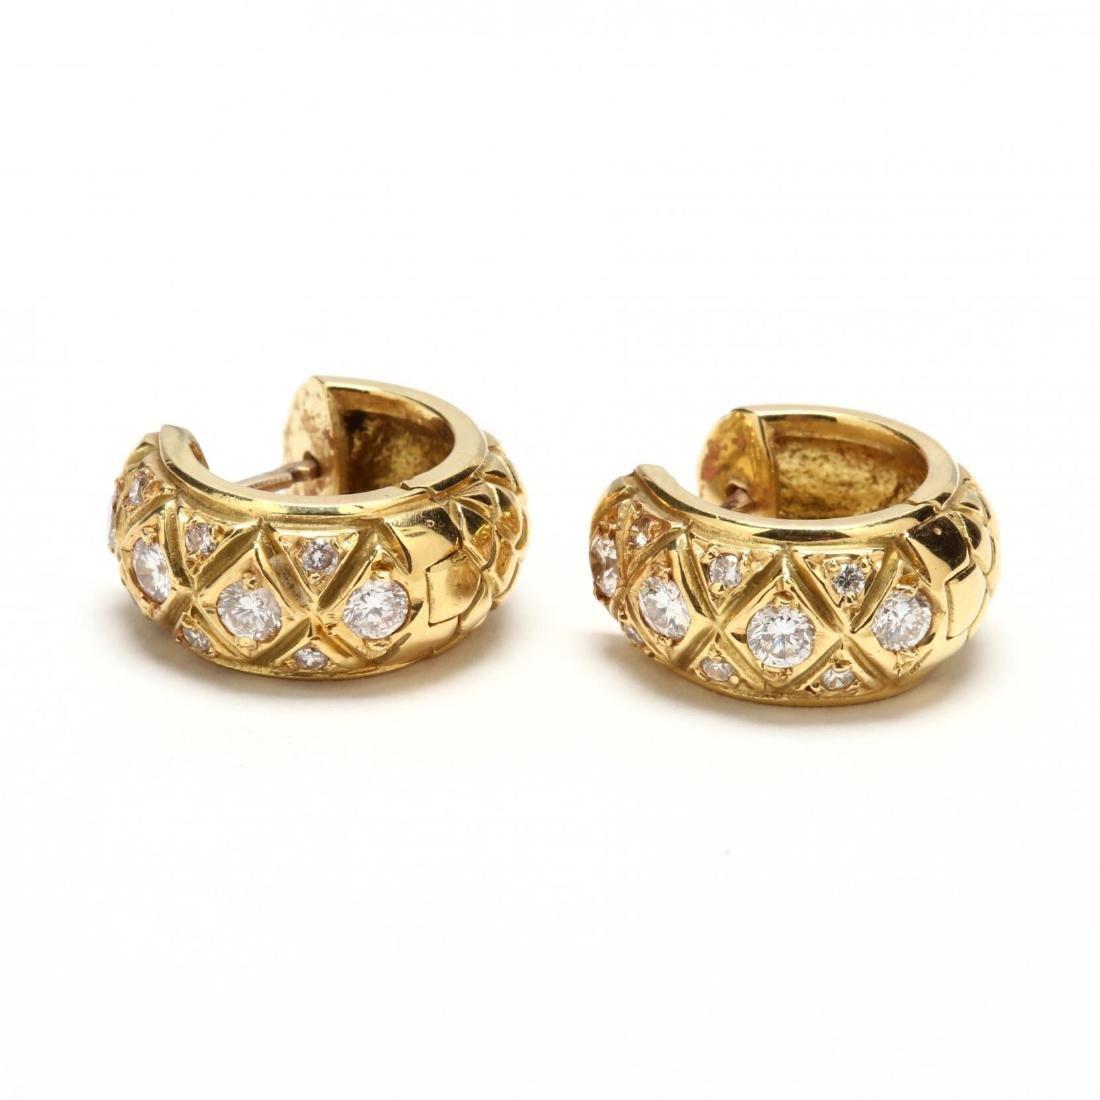 18KT Gold and Diamond Huggie Earrings